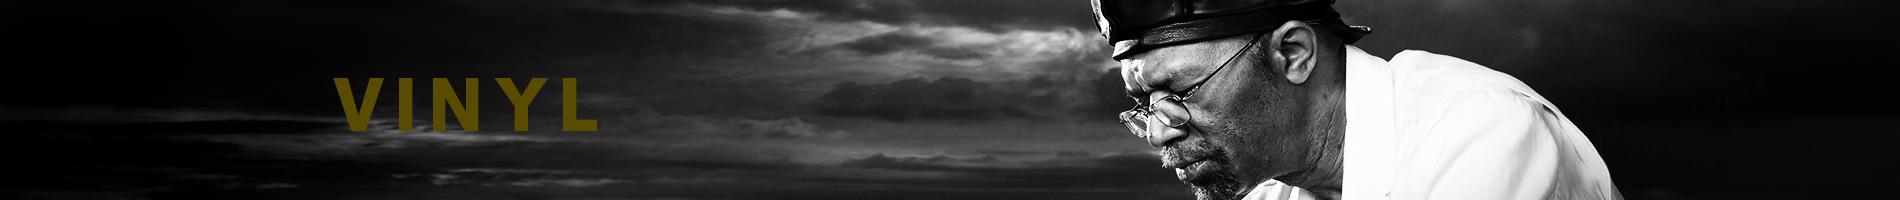 beres-banner-vp-reggaevinyl-1900x200.png